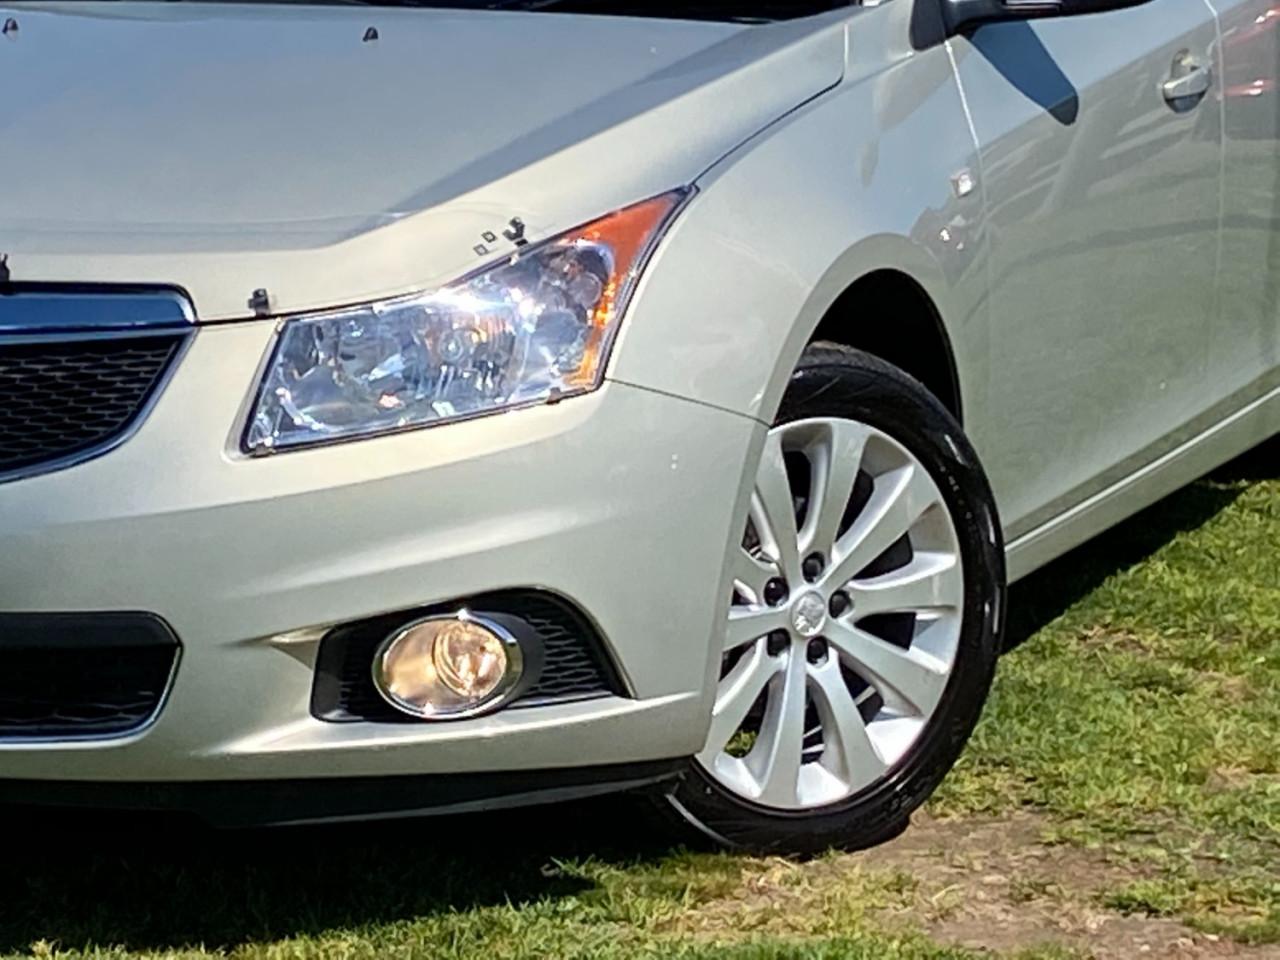 2012 Holden Cruze JH SERIES II MY12 CDX Hatchback Image 4